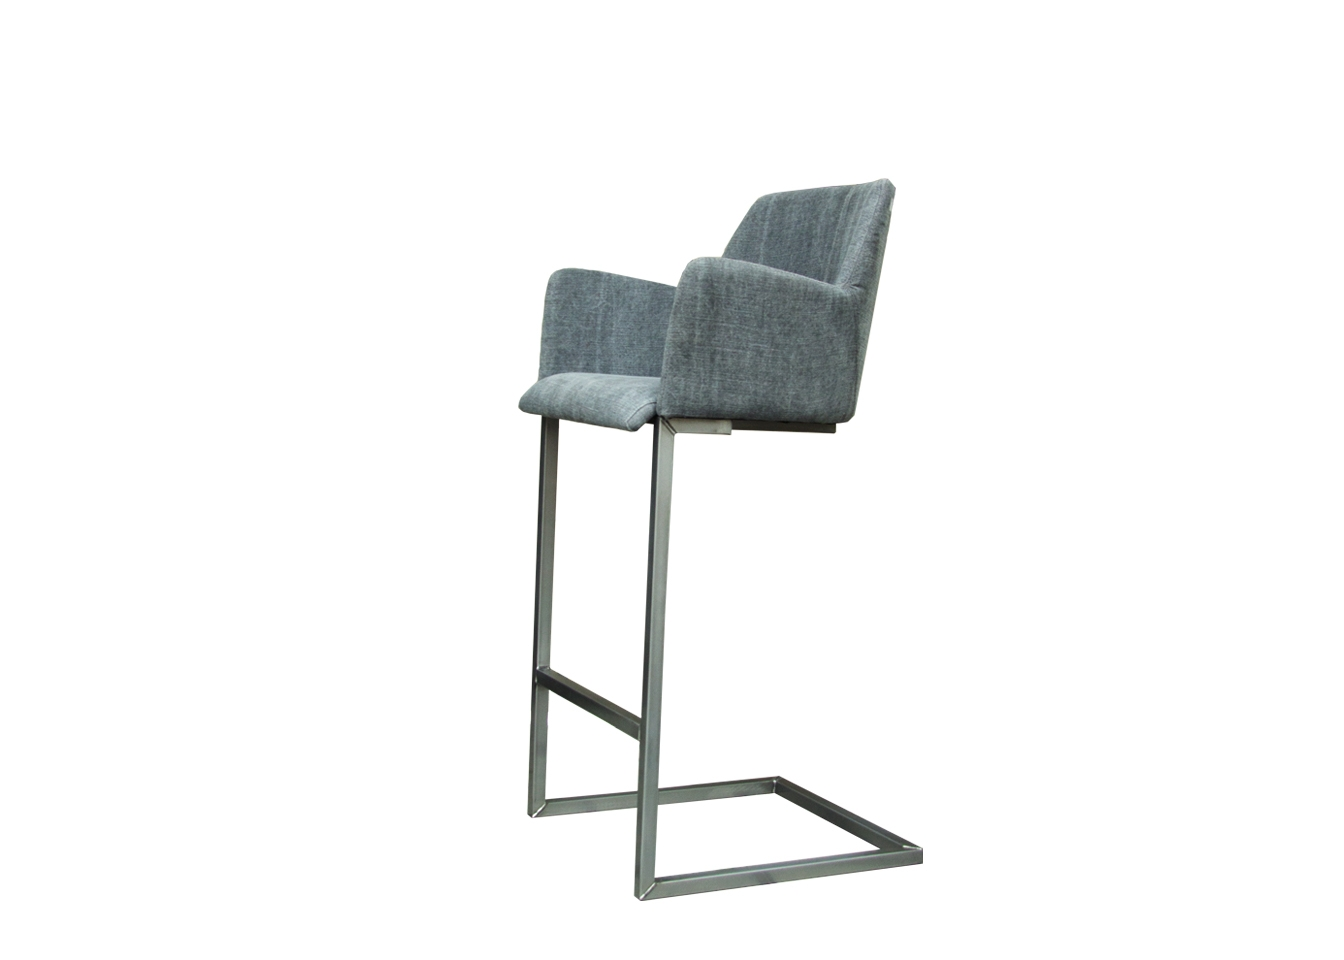 Стул барный СтивБарные стулья<br><br><br>Material: Металл<br>Width см: 56<br>Depth см: 57<br>Height см: 115